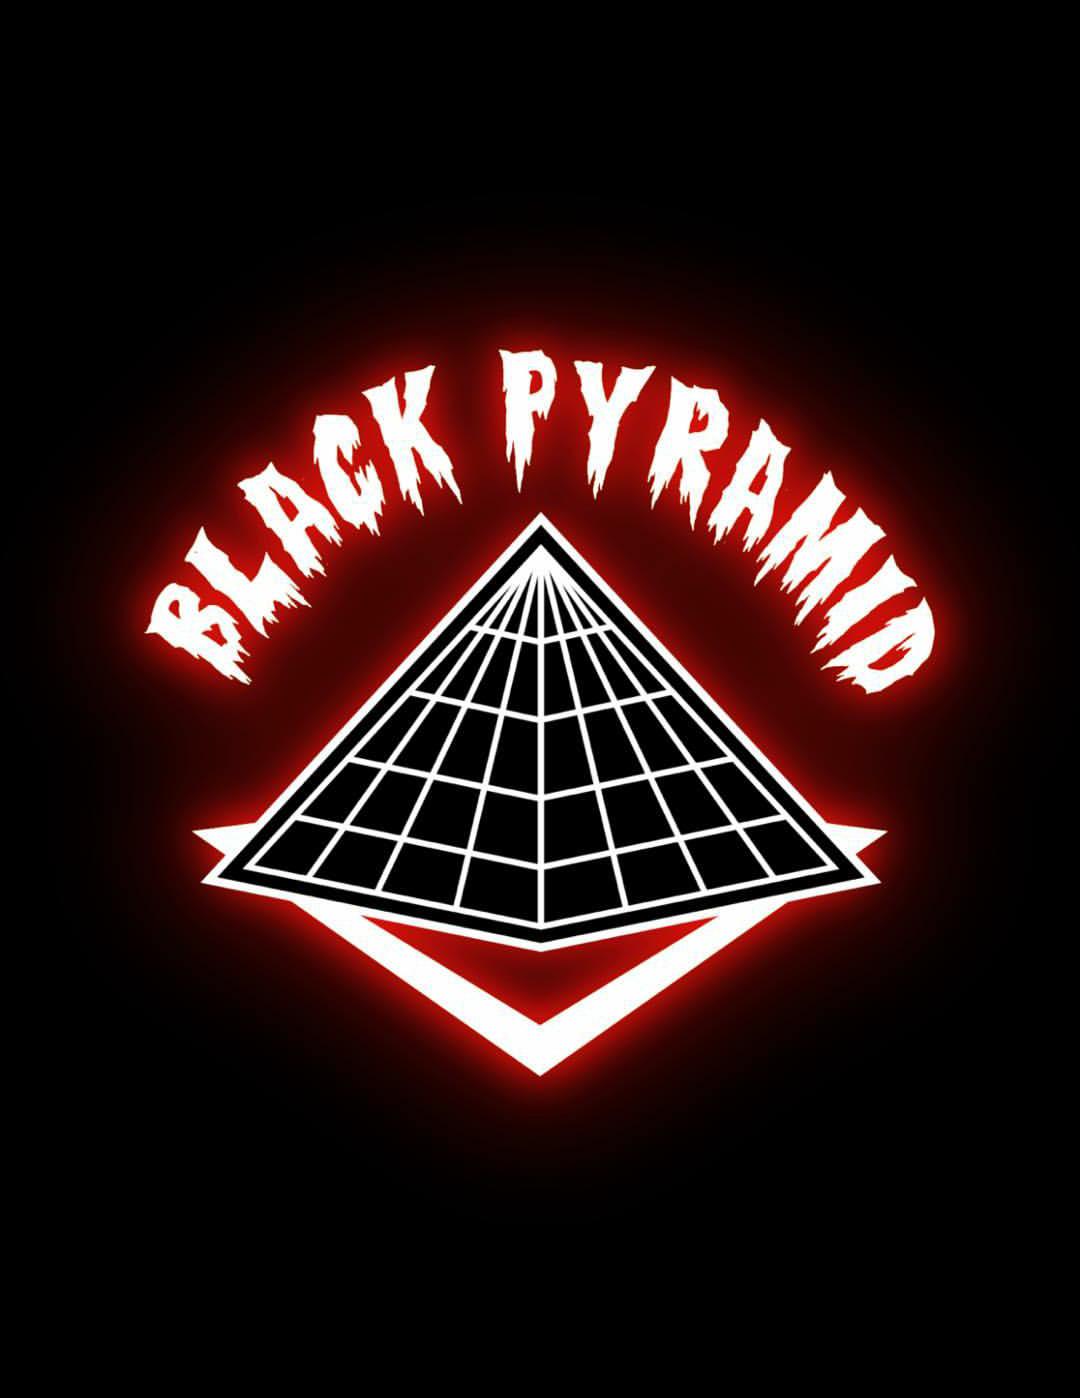 black pyramid wallpaper  Pin by Terrance Bernard on Terrance Bernard-Black Diamonds In Egypt ...